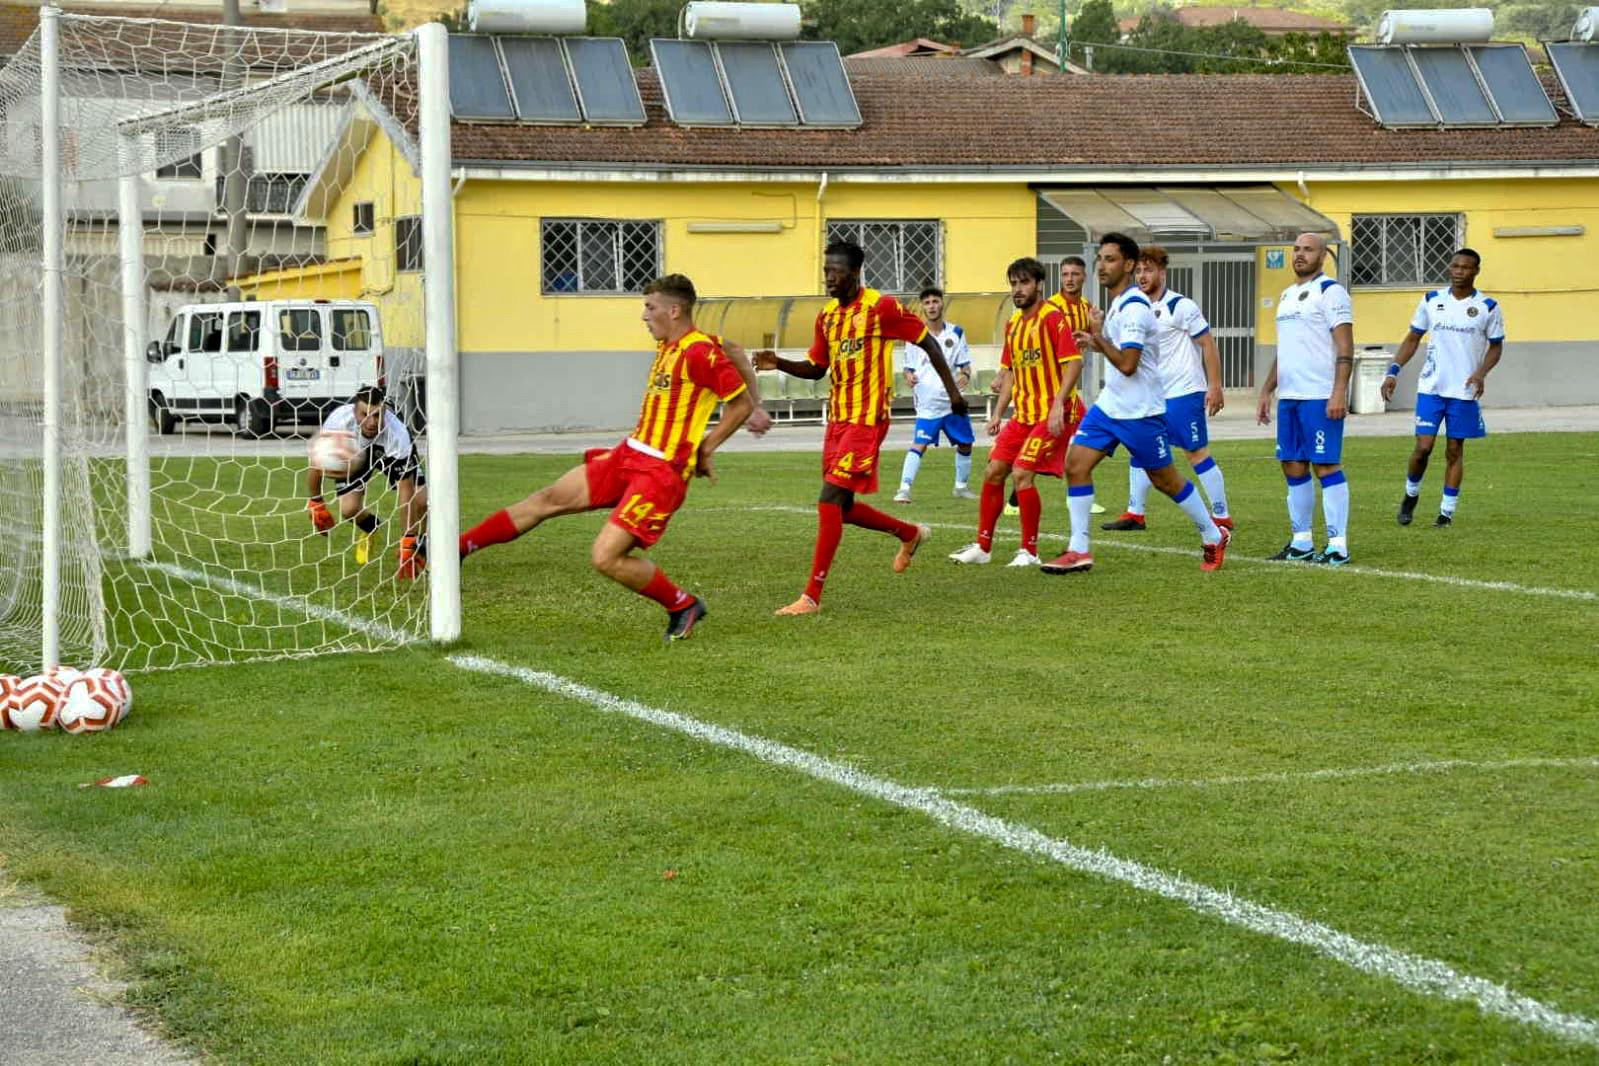 Polisportiva Santa Maria 8-0 Pollese, la sintesi